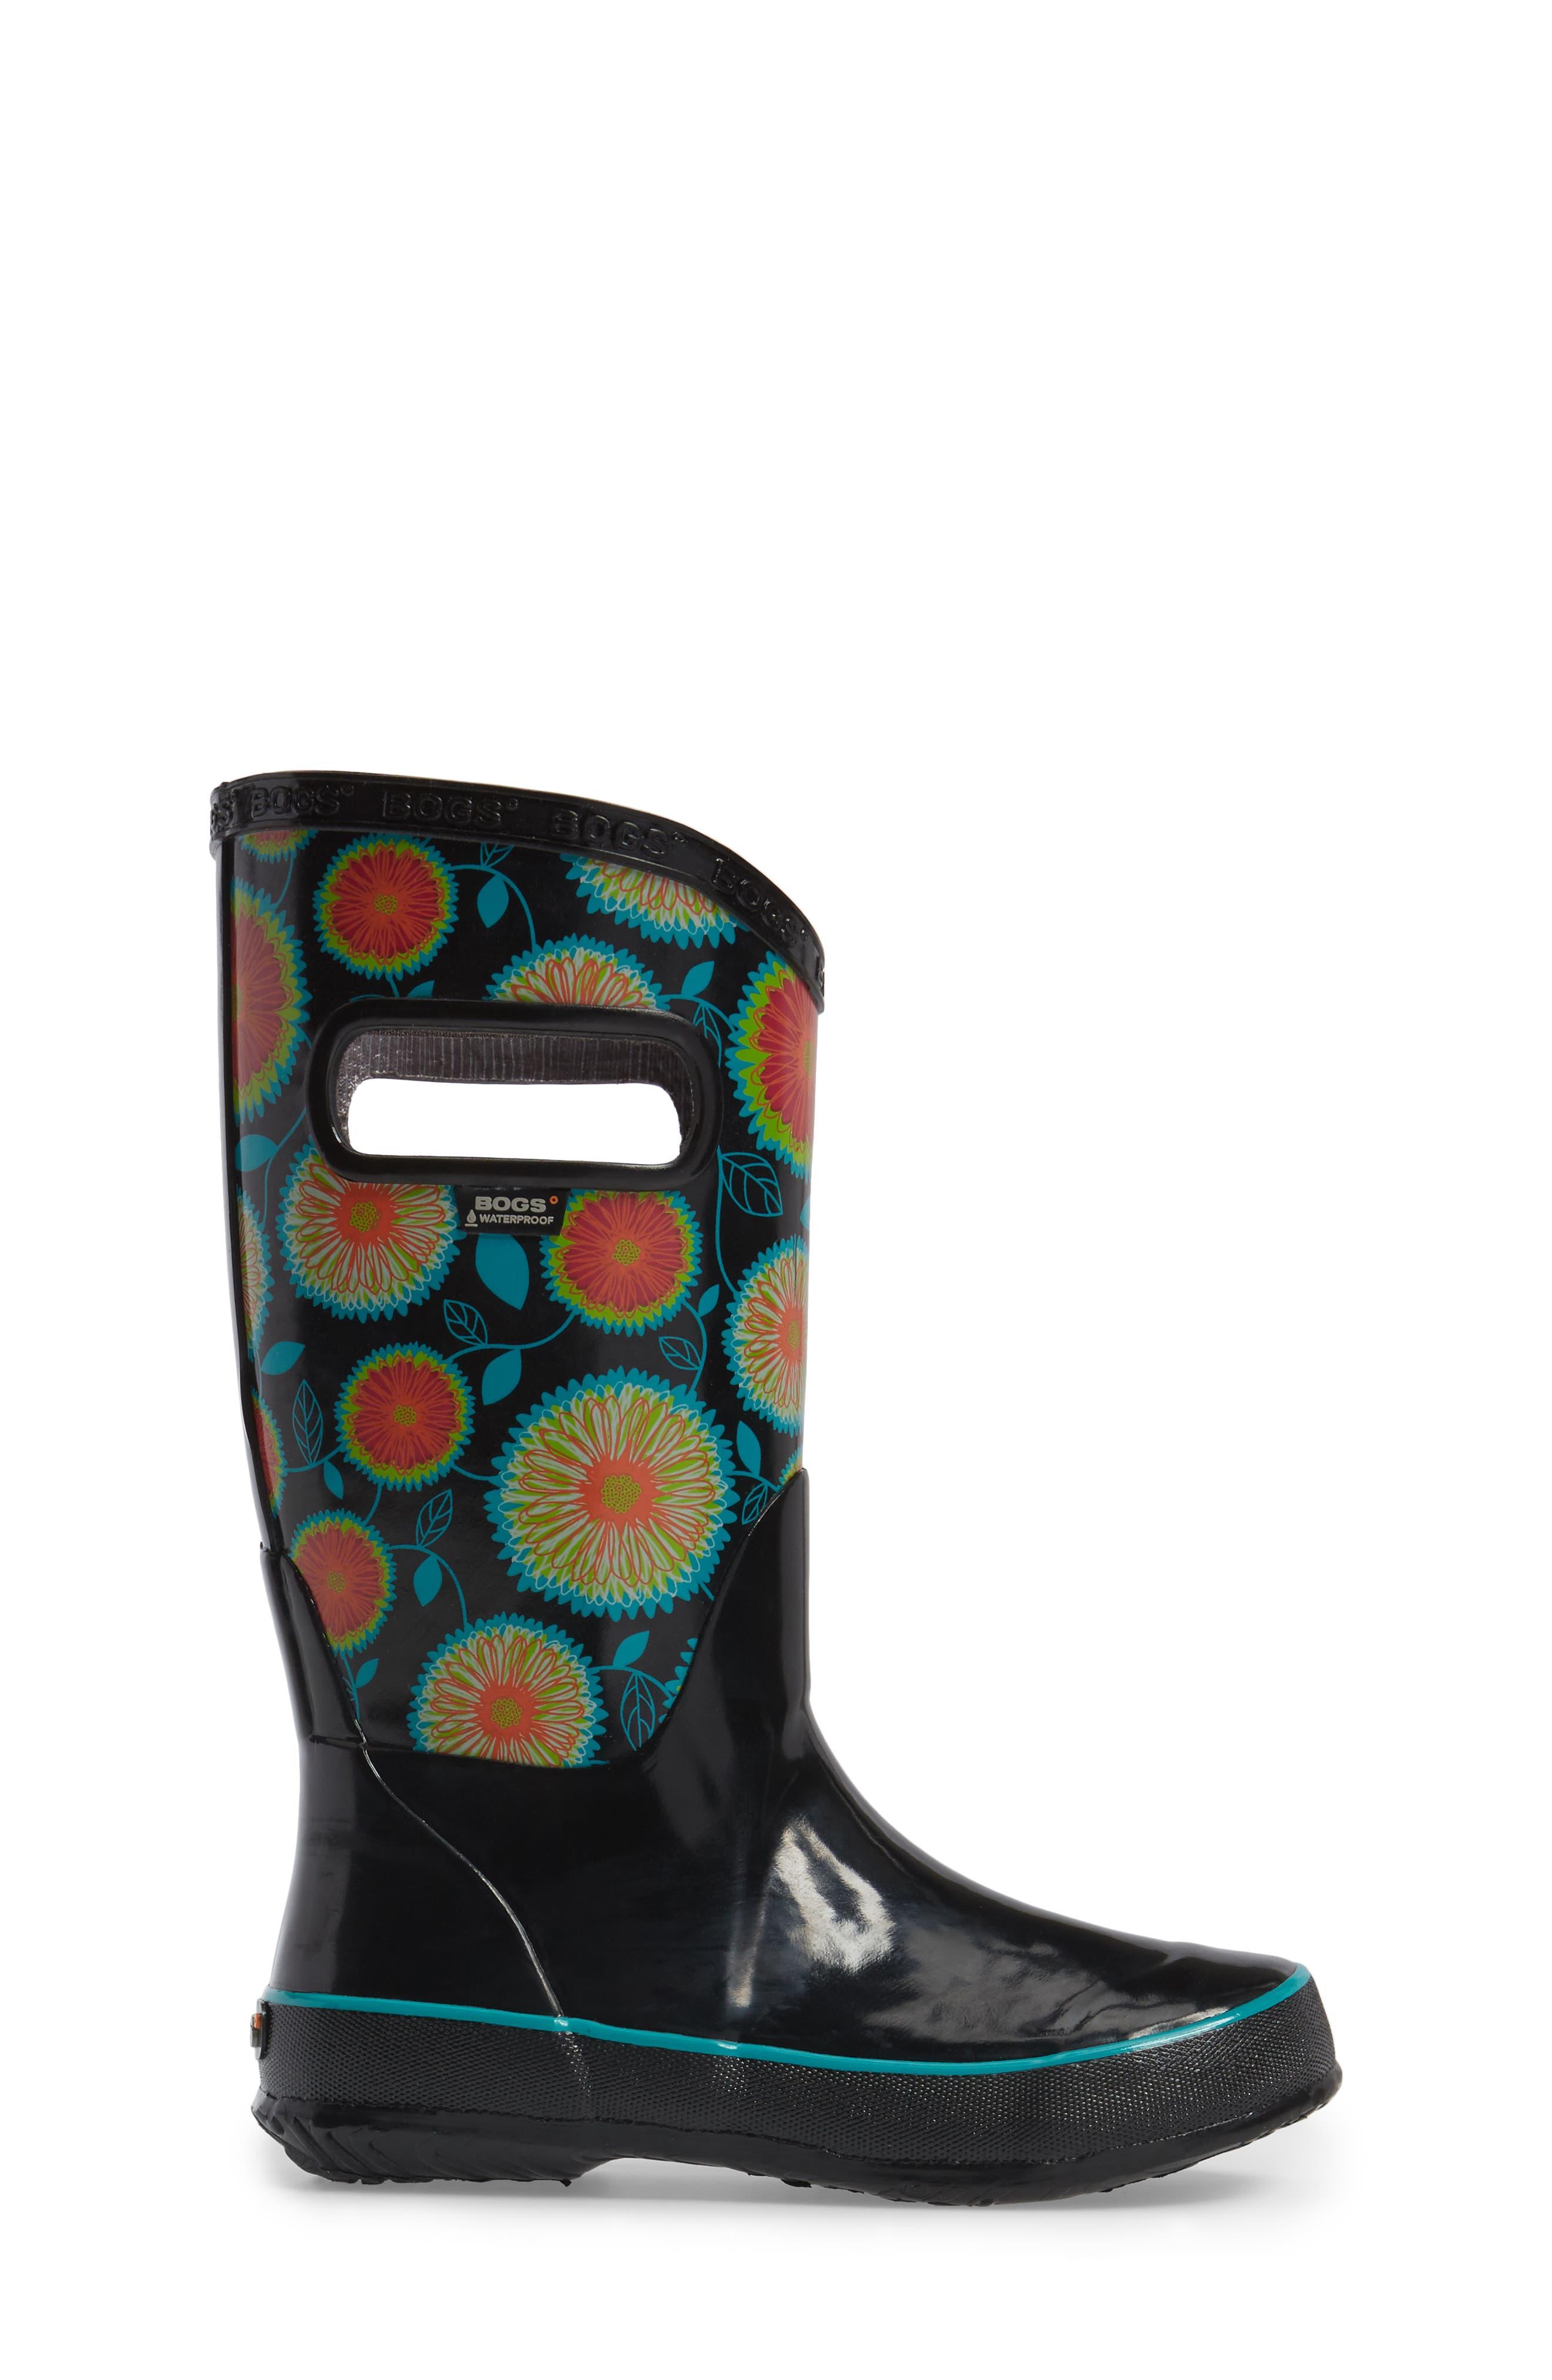 Wildflowers Waterproof Rubber Rain Boot,                             Alternate thumbnail 3, color,                             009